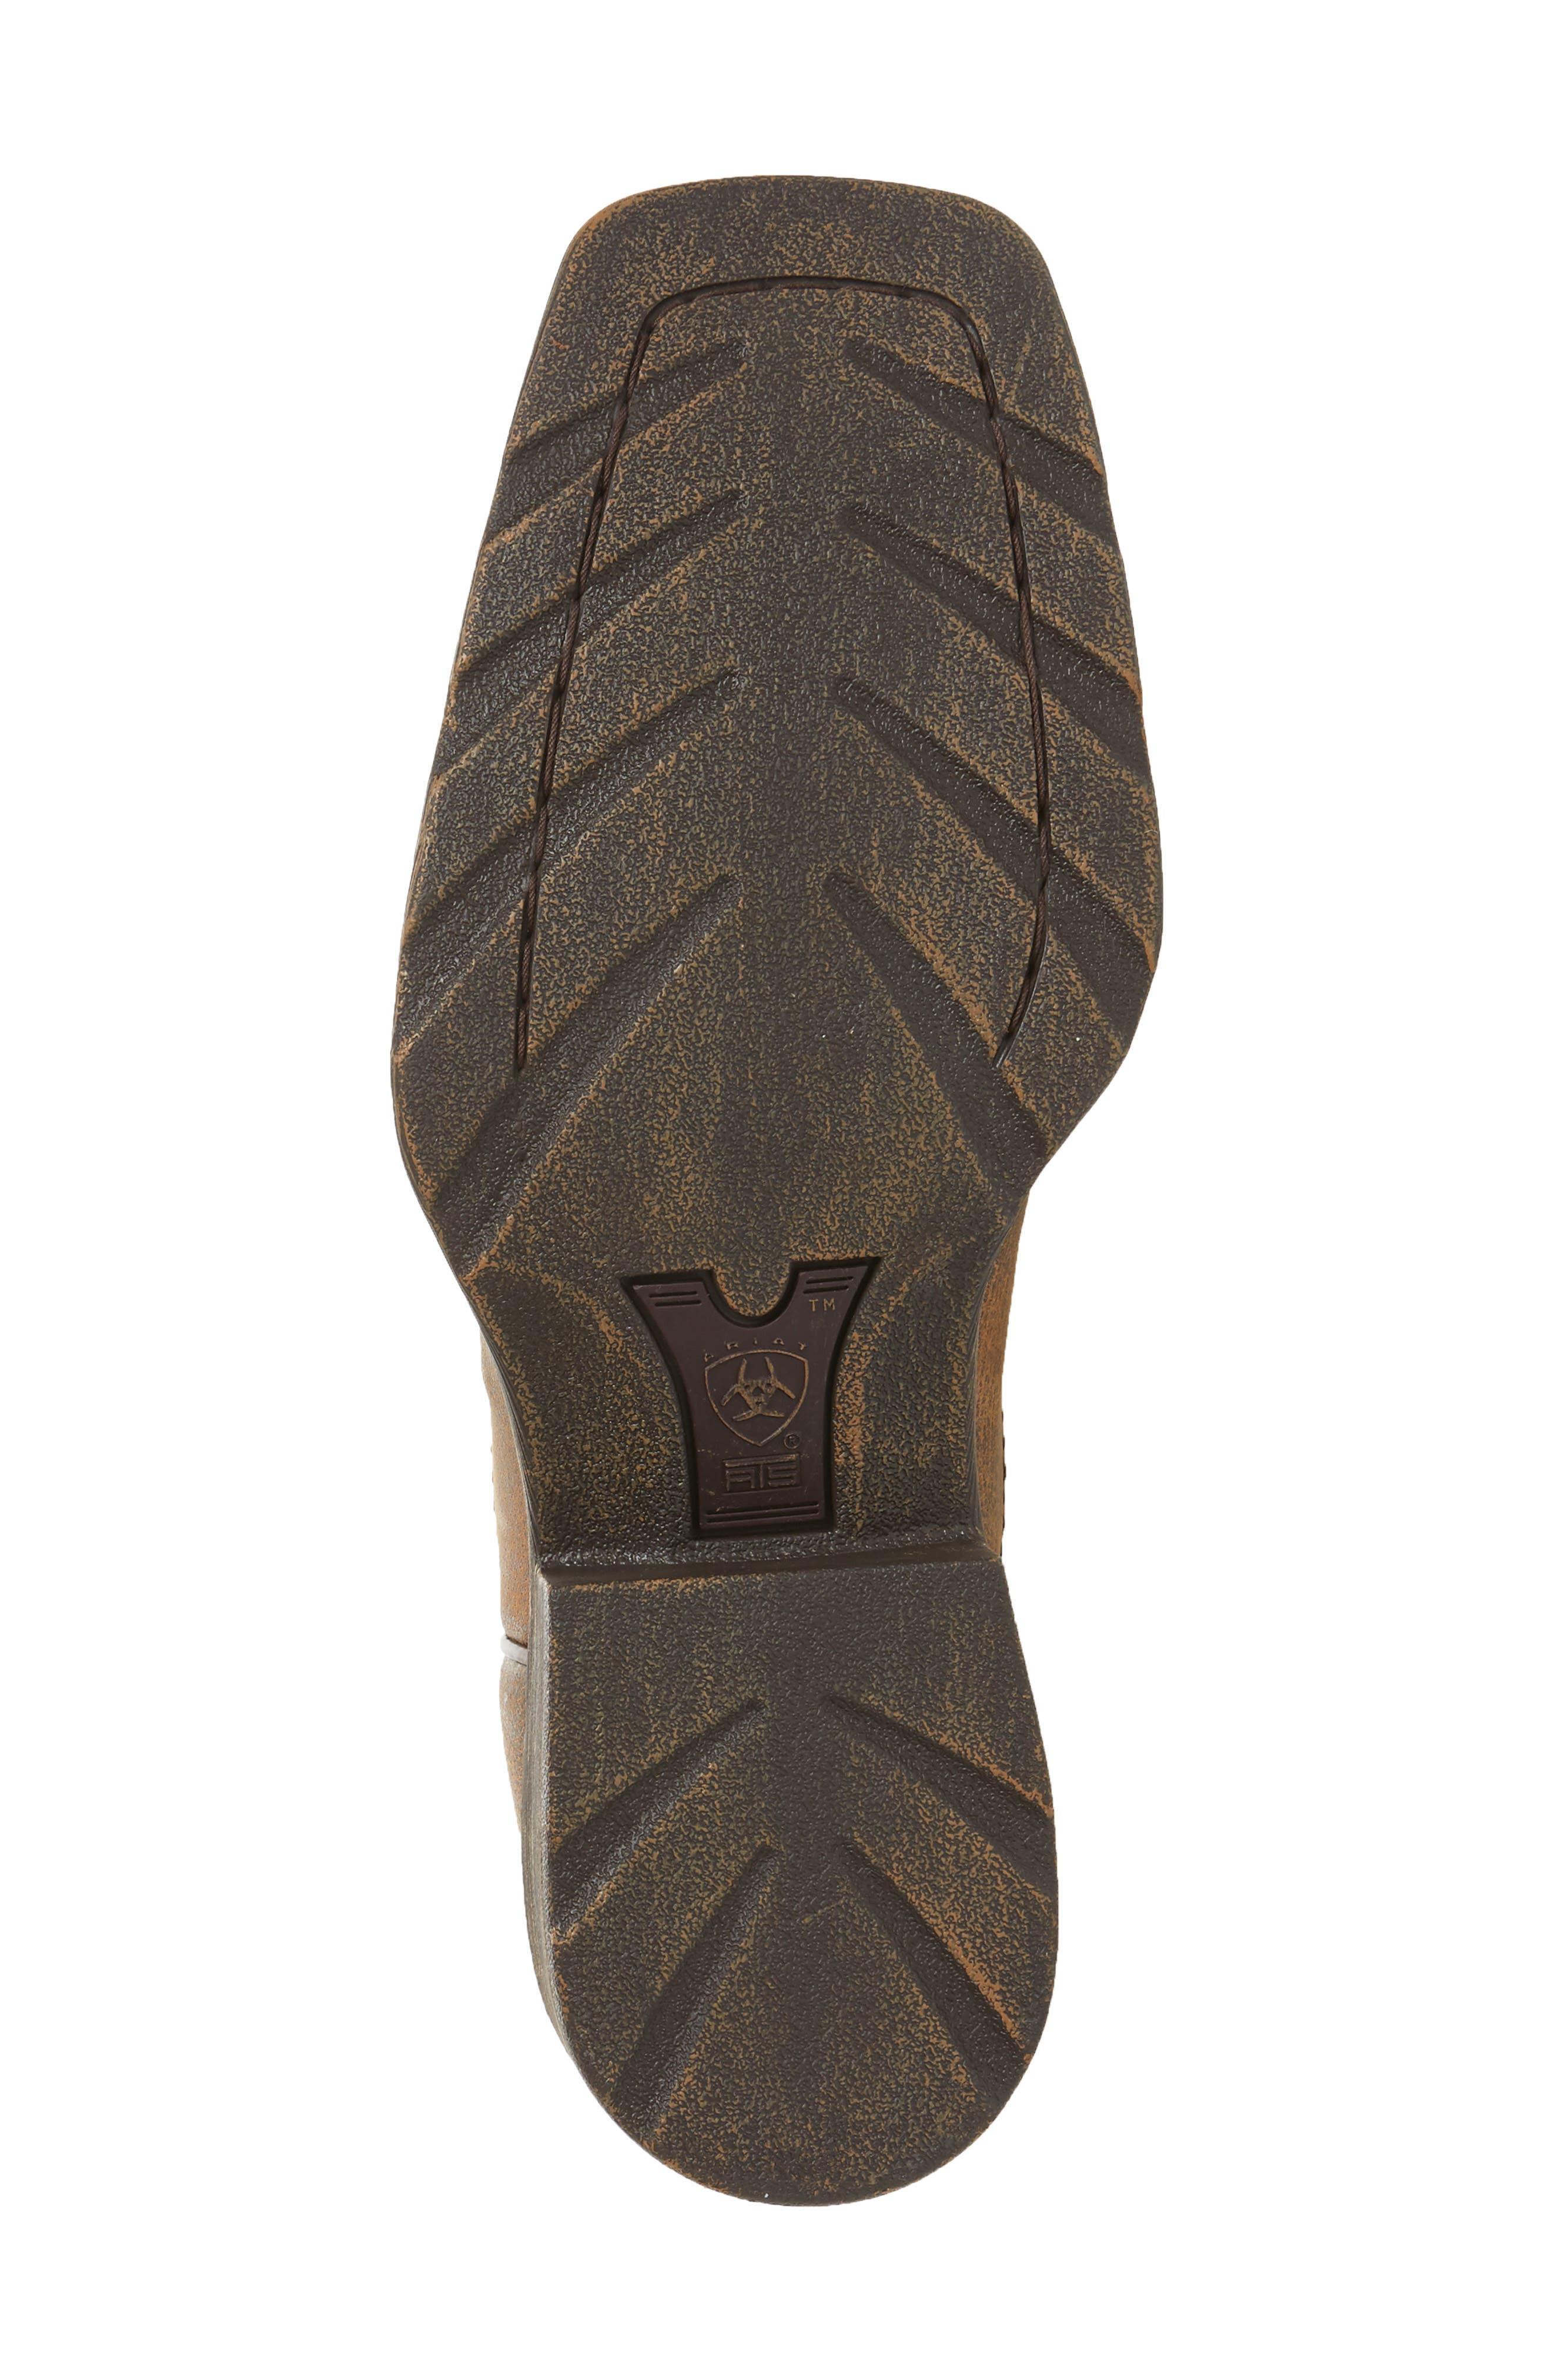 Western Rambler Cowboy Boot,                             Alternate thumbnail 6, color,                             200